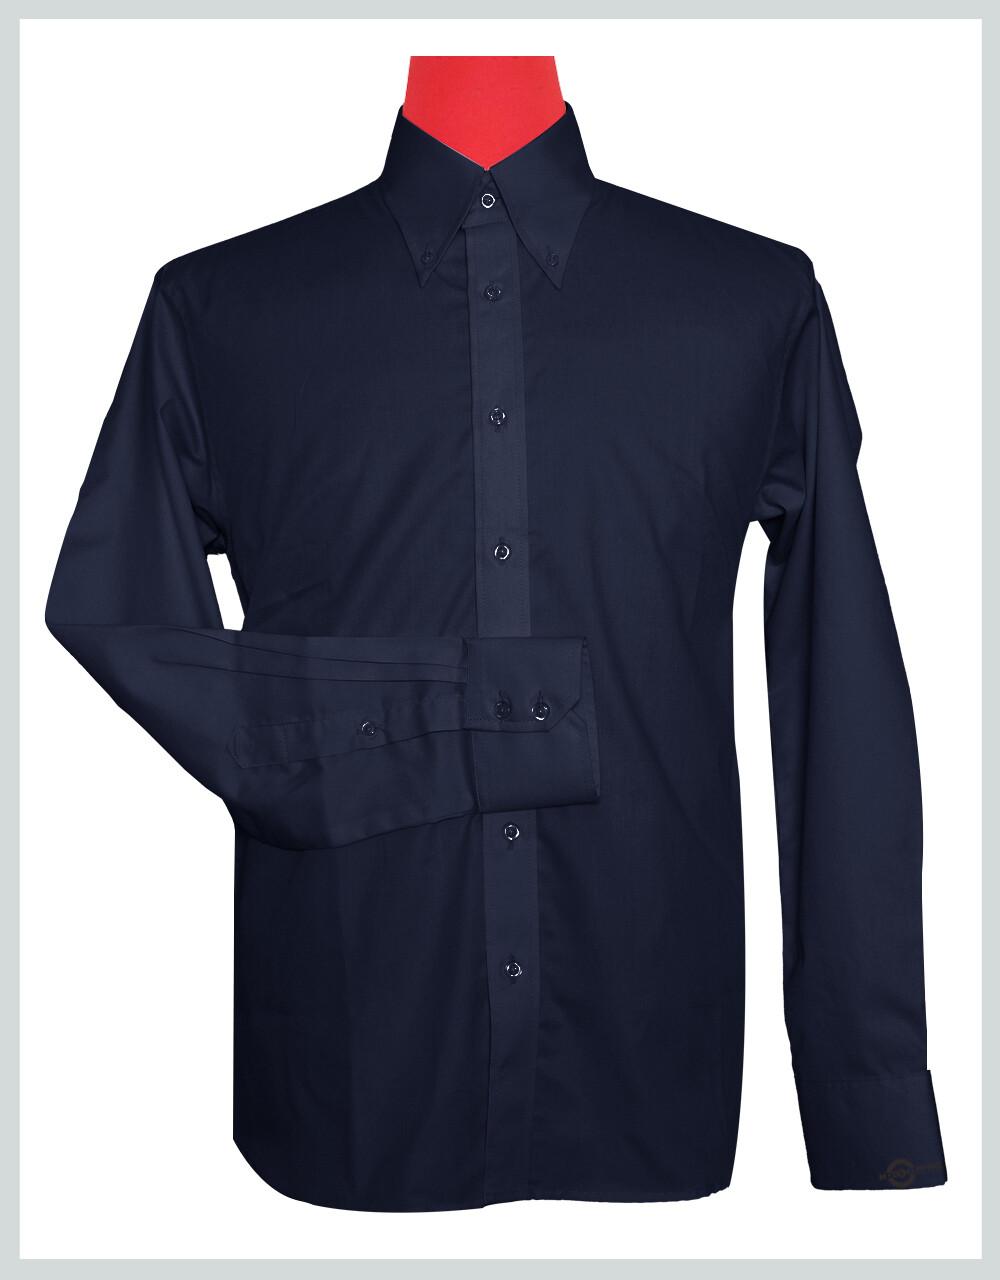 Button-Down Collar Shirt | Navy Blue Color Shirt For Man